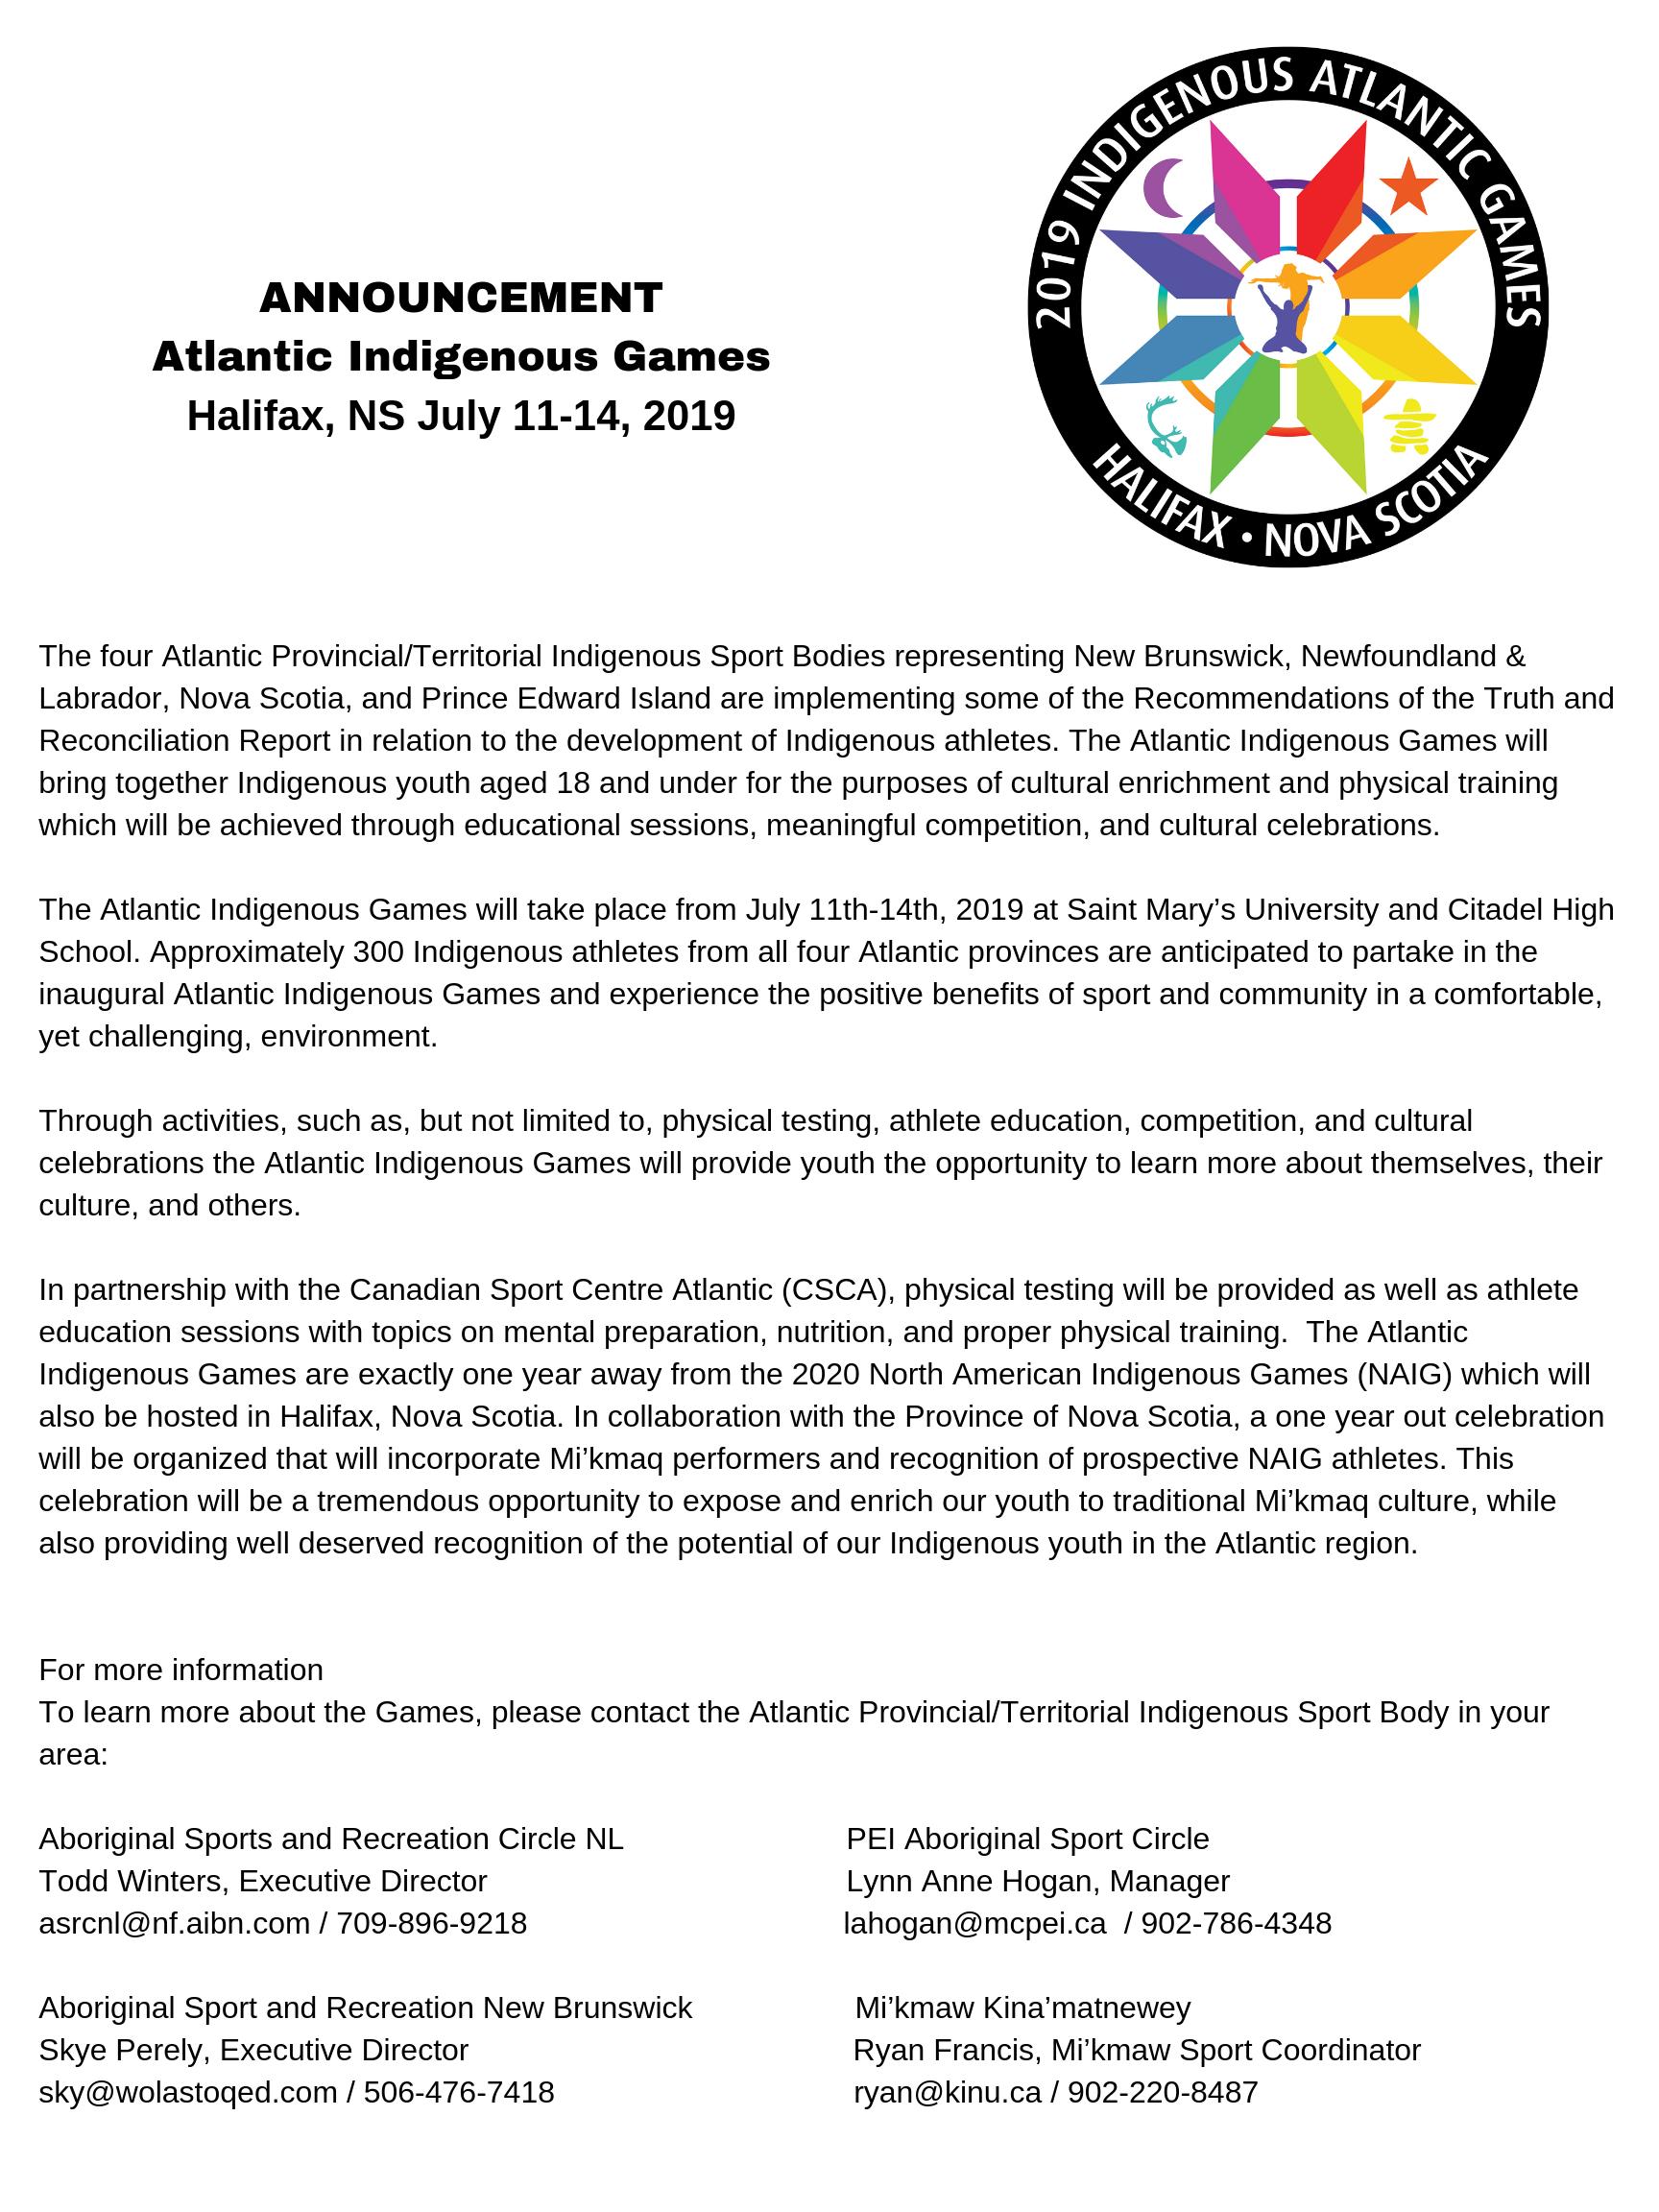 Atlantic Indigenous Games Announcement_social media.png